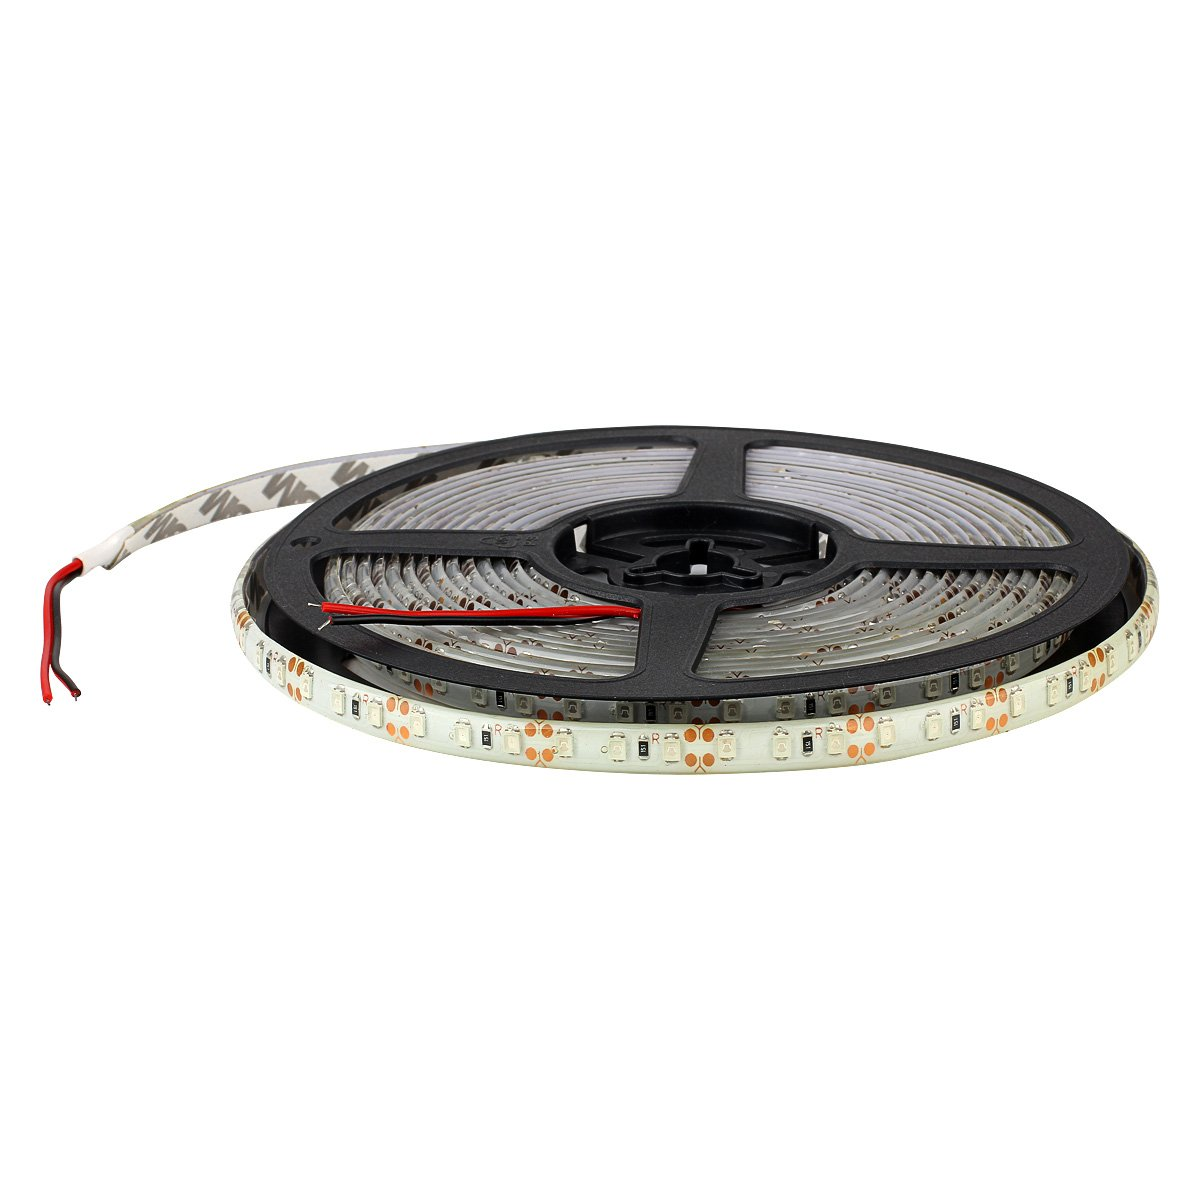 SUPERNIGHT High Density Green Waterproof Led Light Strip, SMD 3528, 5 Meter or 16 Ft LED Strip 120 Leds/M by SUPERNIGHT (Image #3)